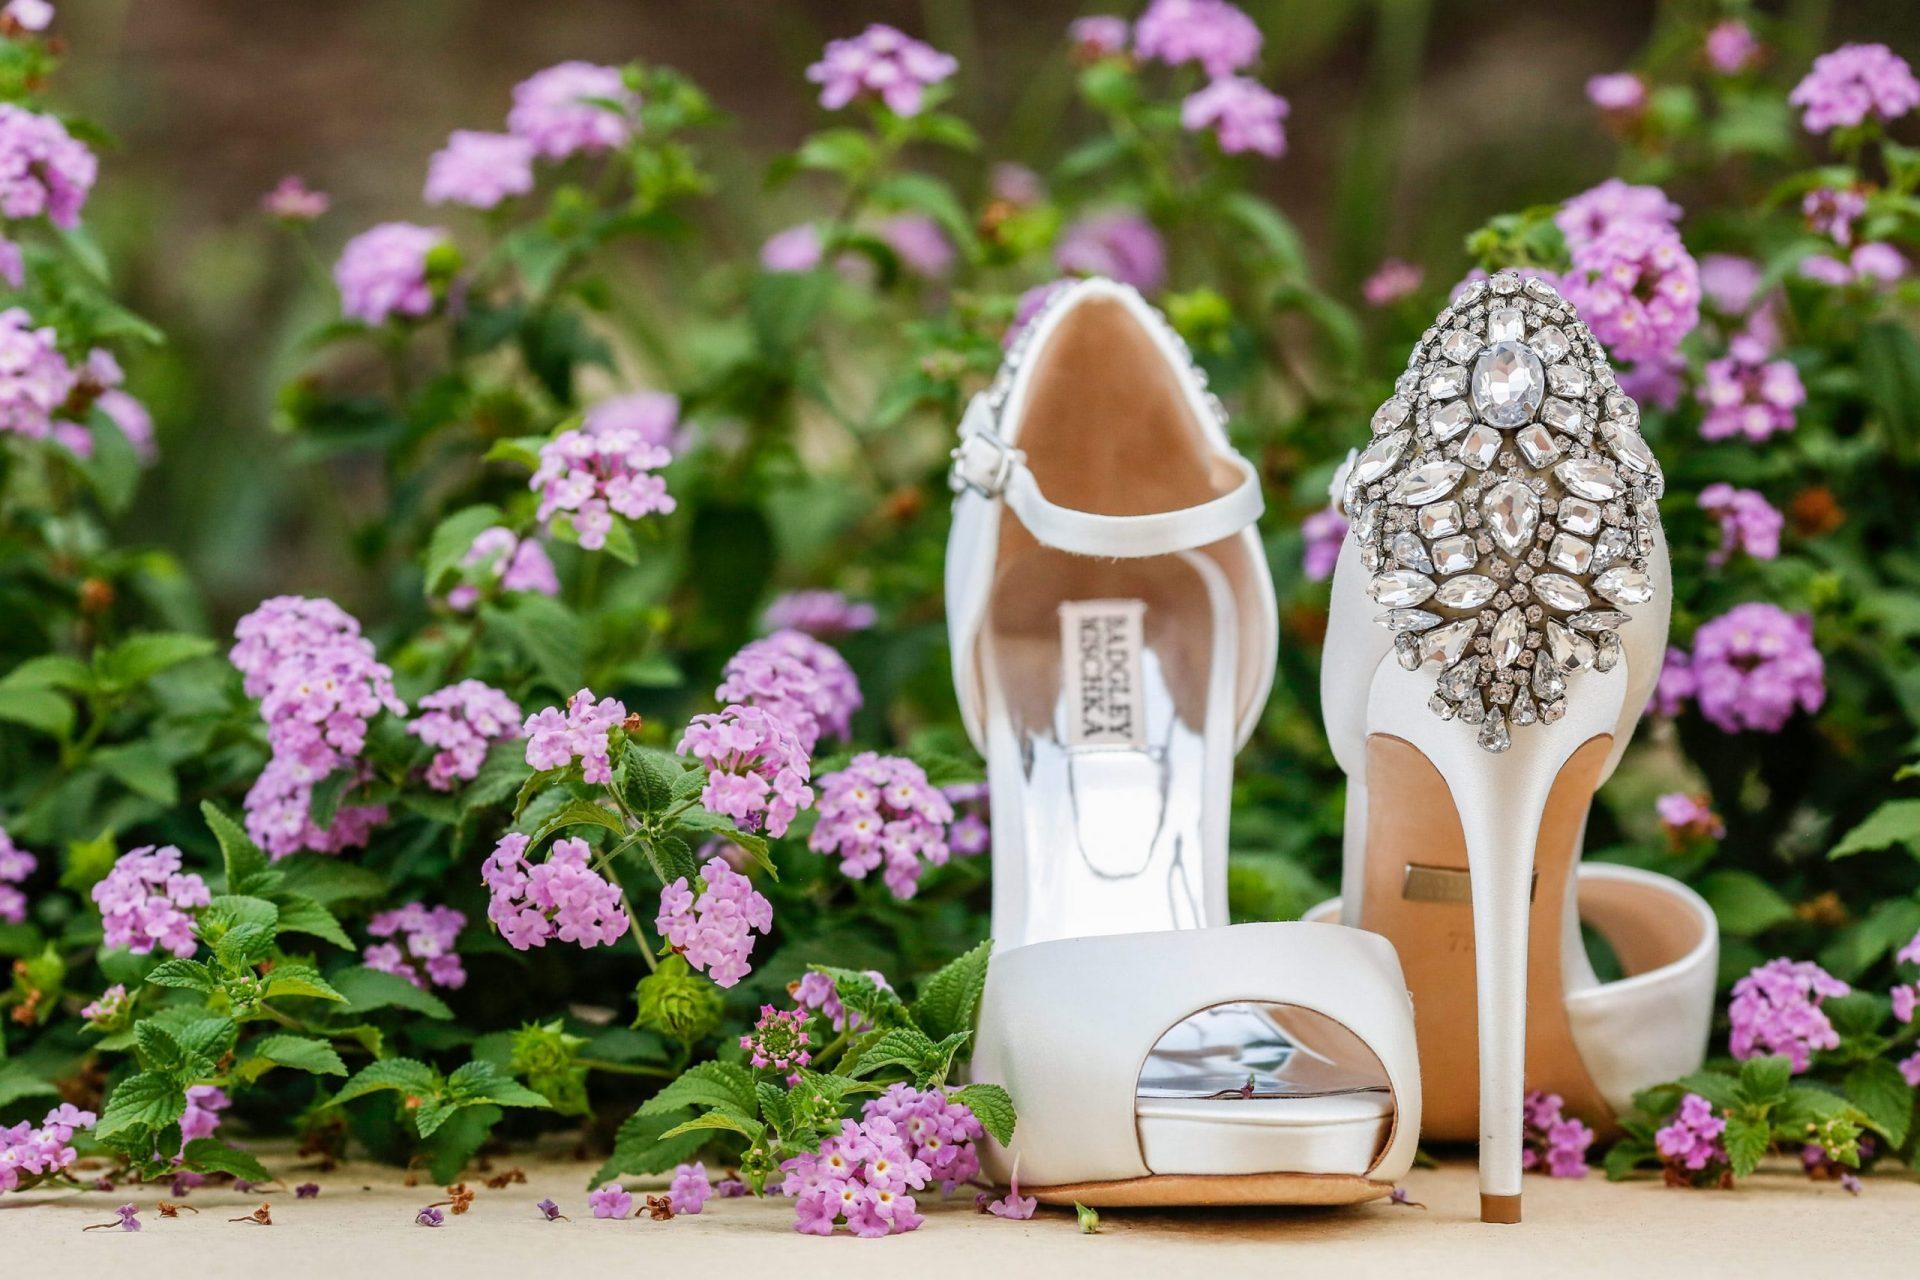 Enza e Samuele, the bride shoes